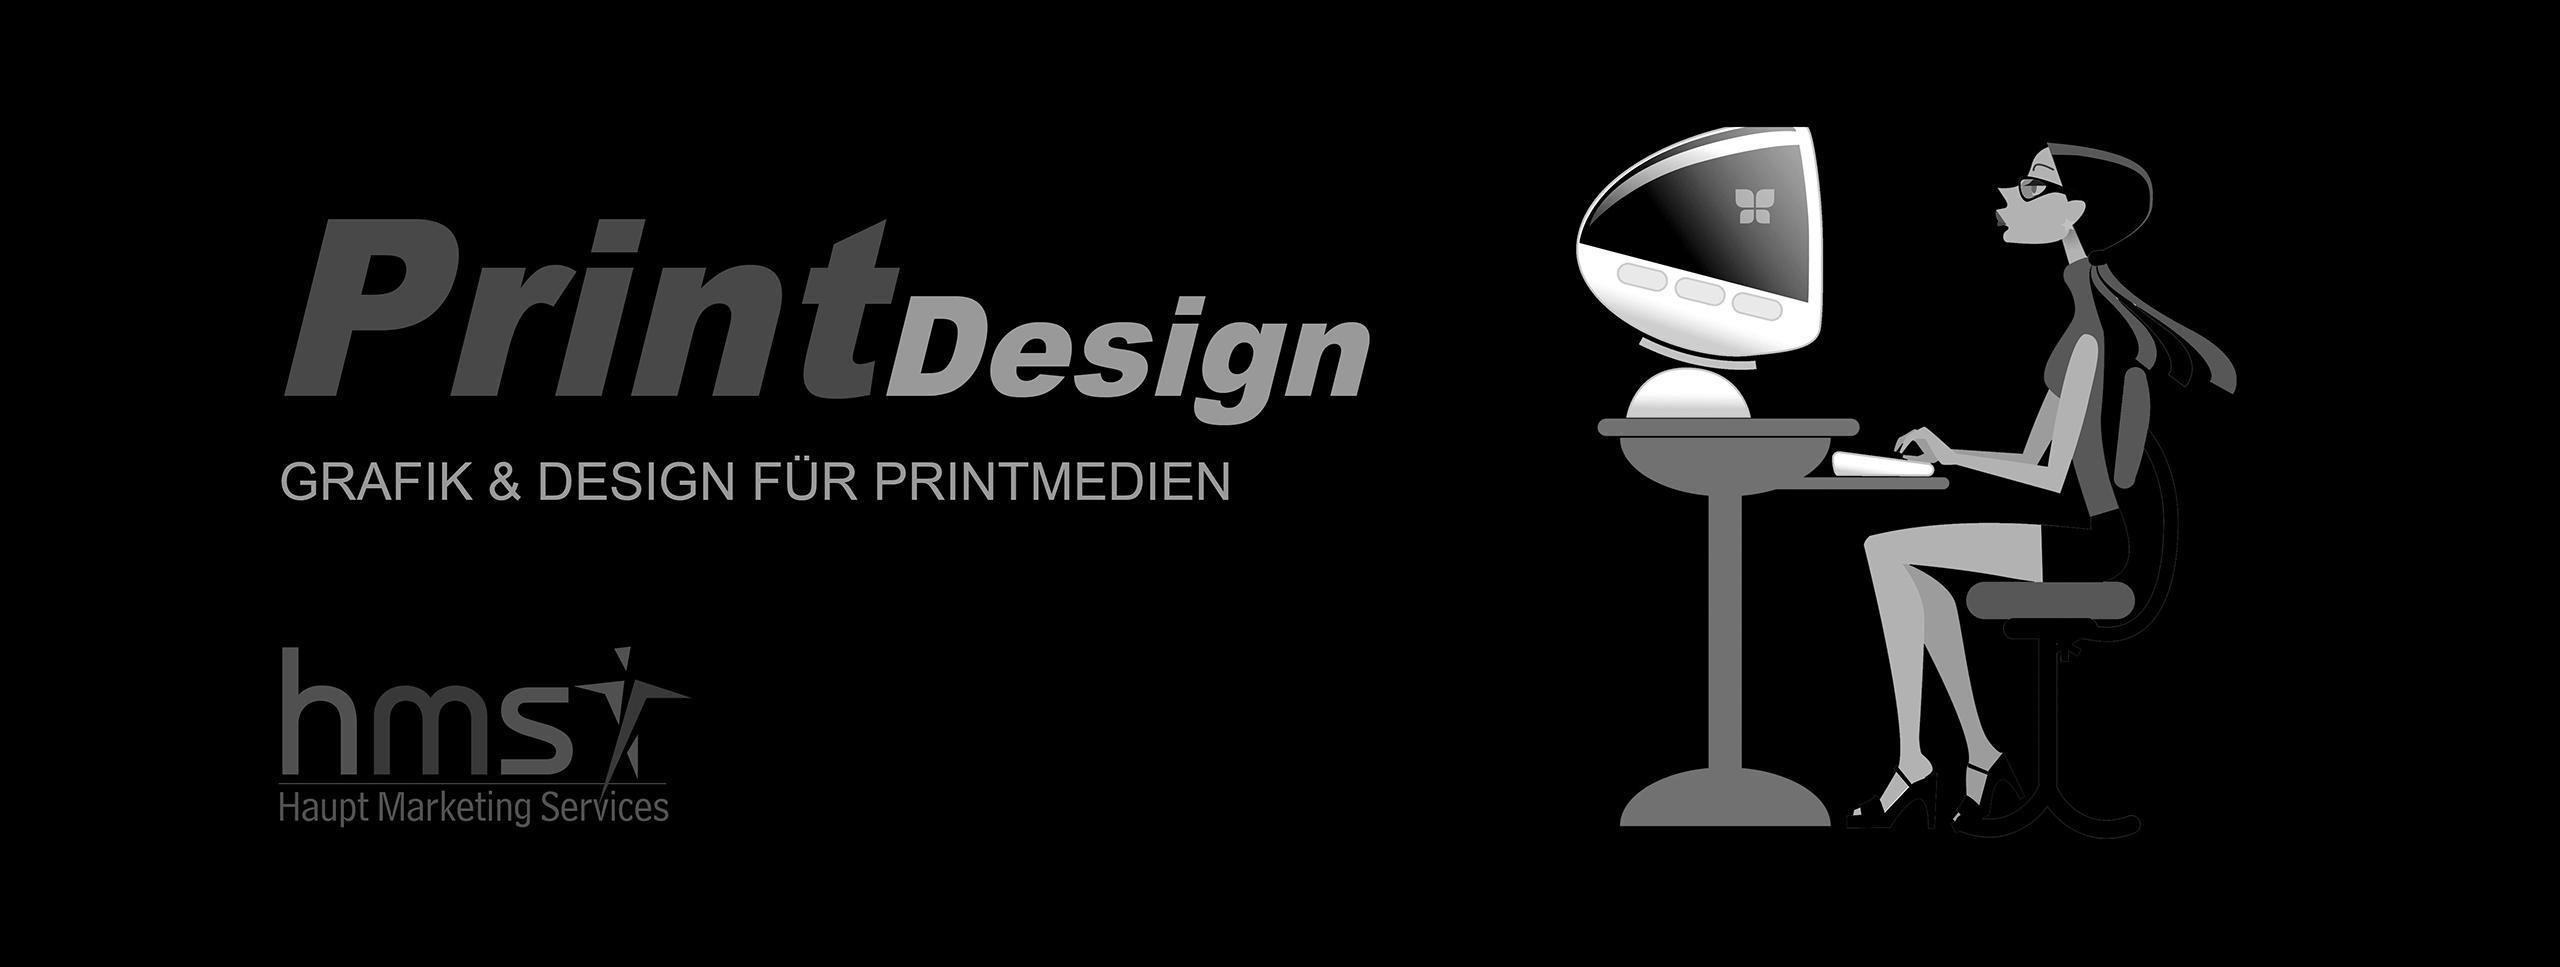 003_Web01_2017_Printdesign_sw